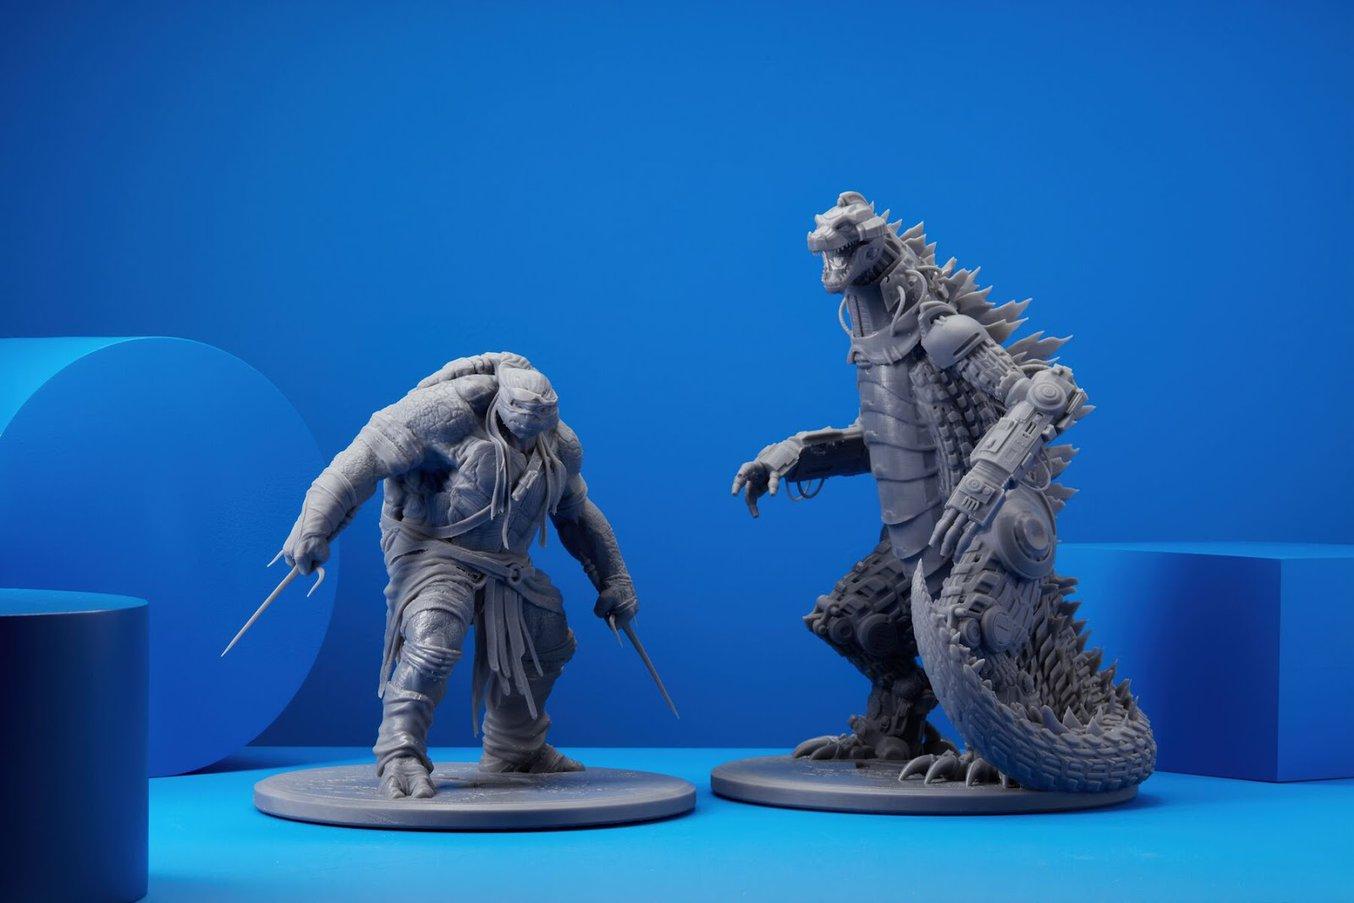 3D printing miniatures and custom figurines